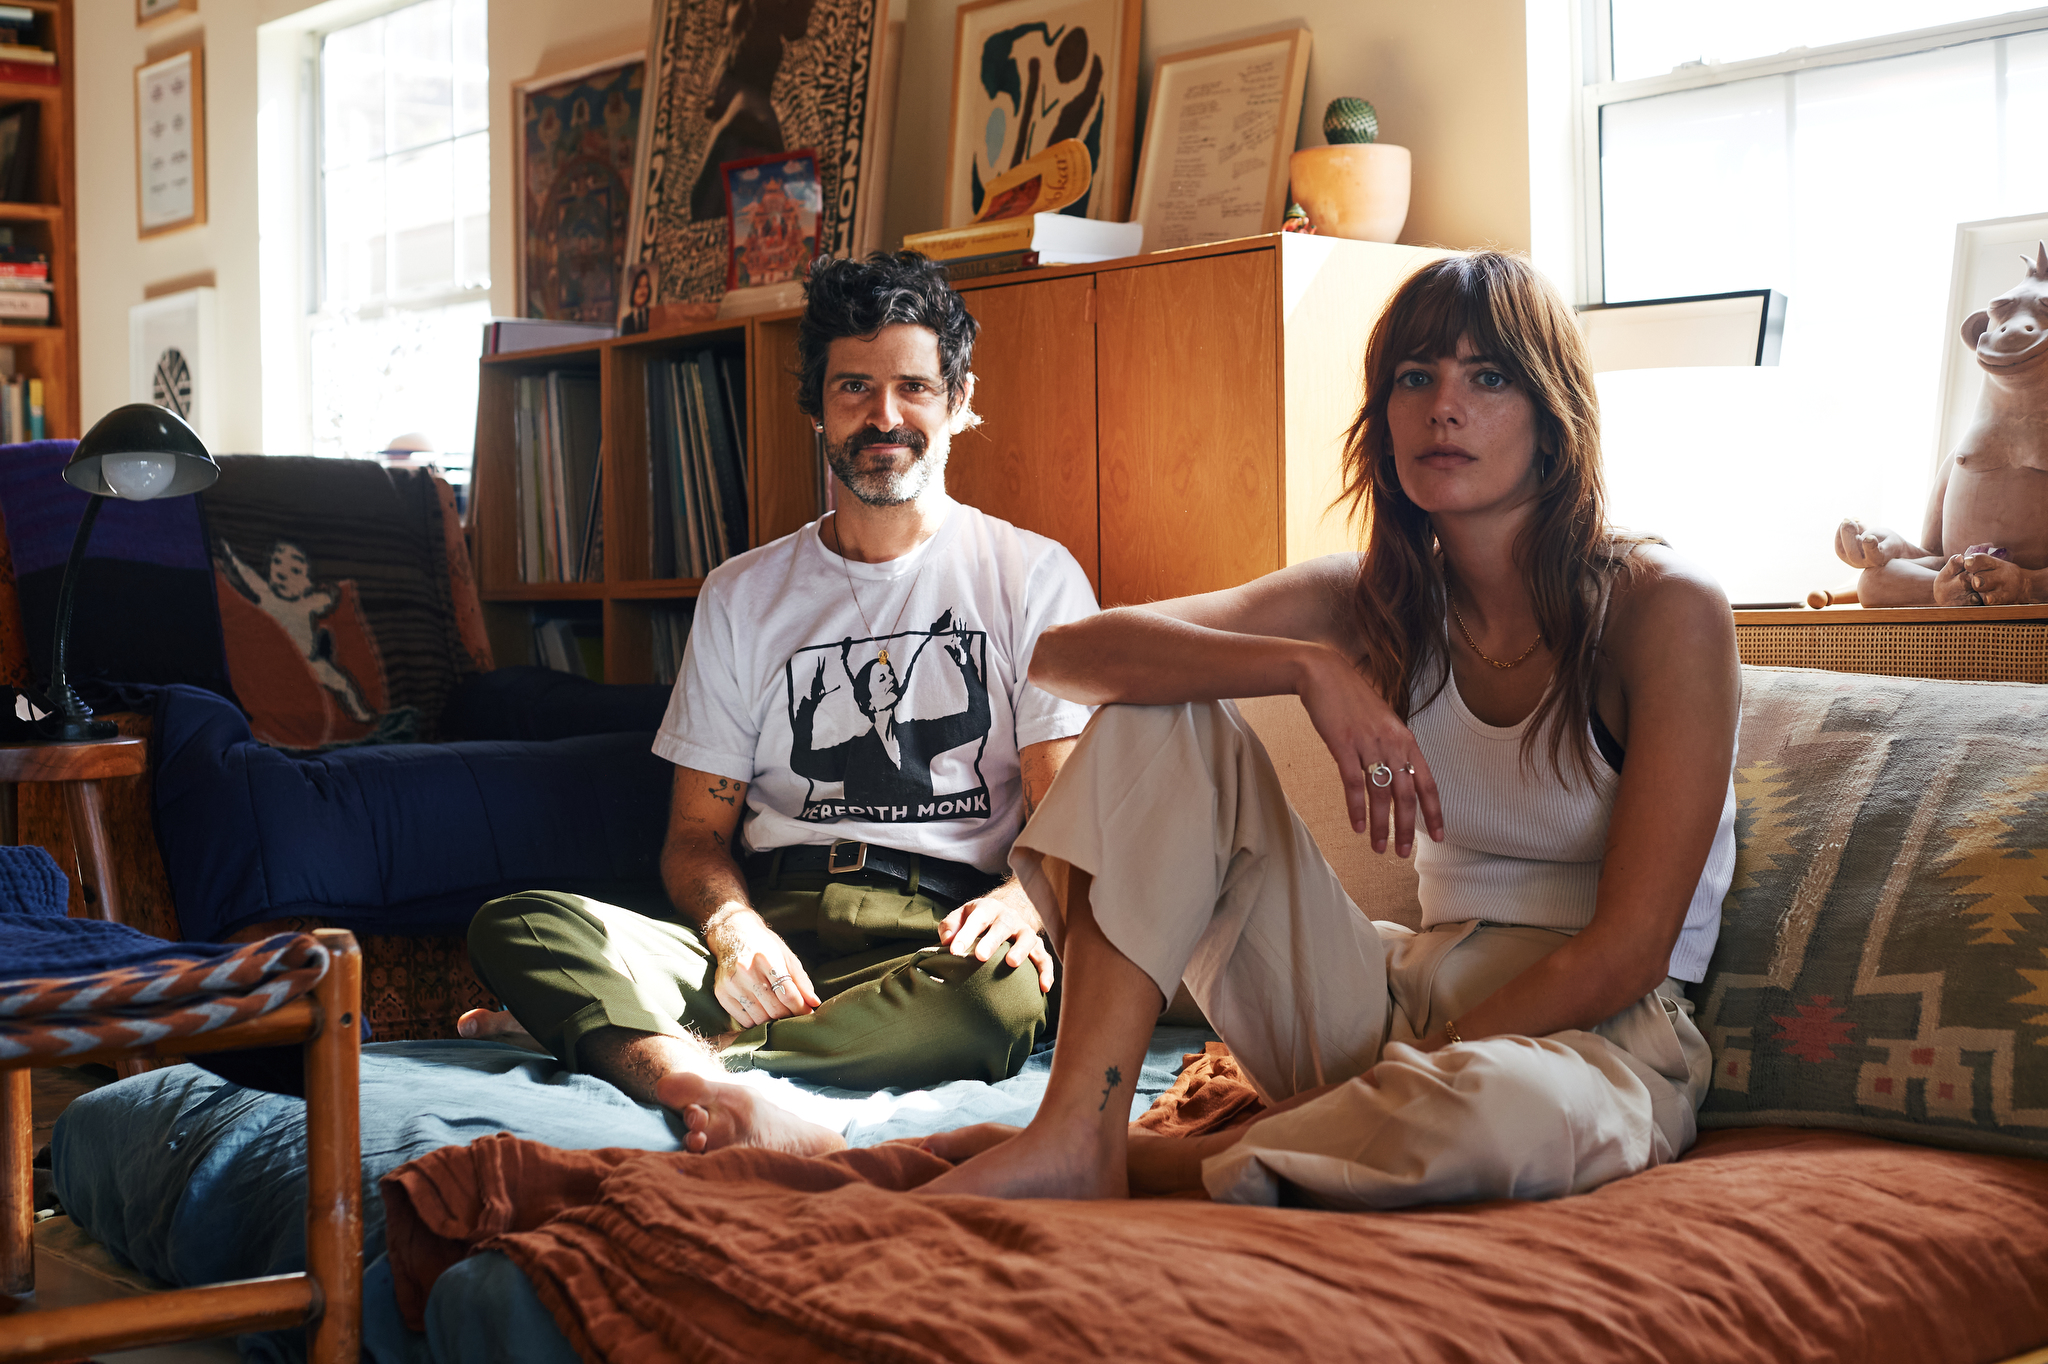 Devendra Banhart and Emily labowe